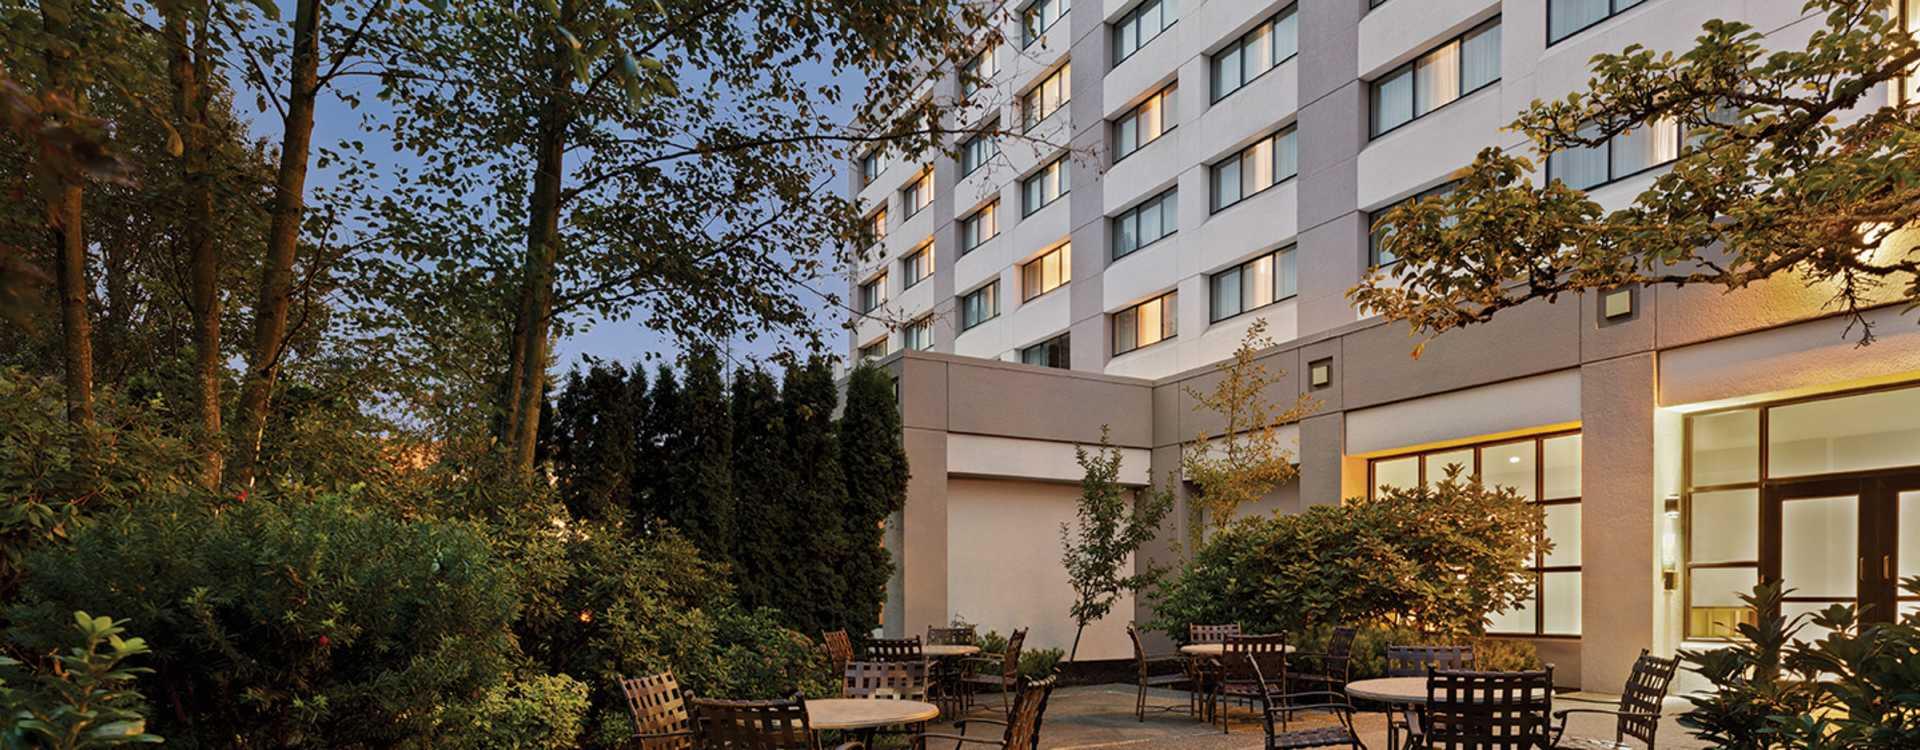 Radisson Hotel Seattle Airport Outdoor Garden Patio